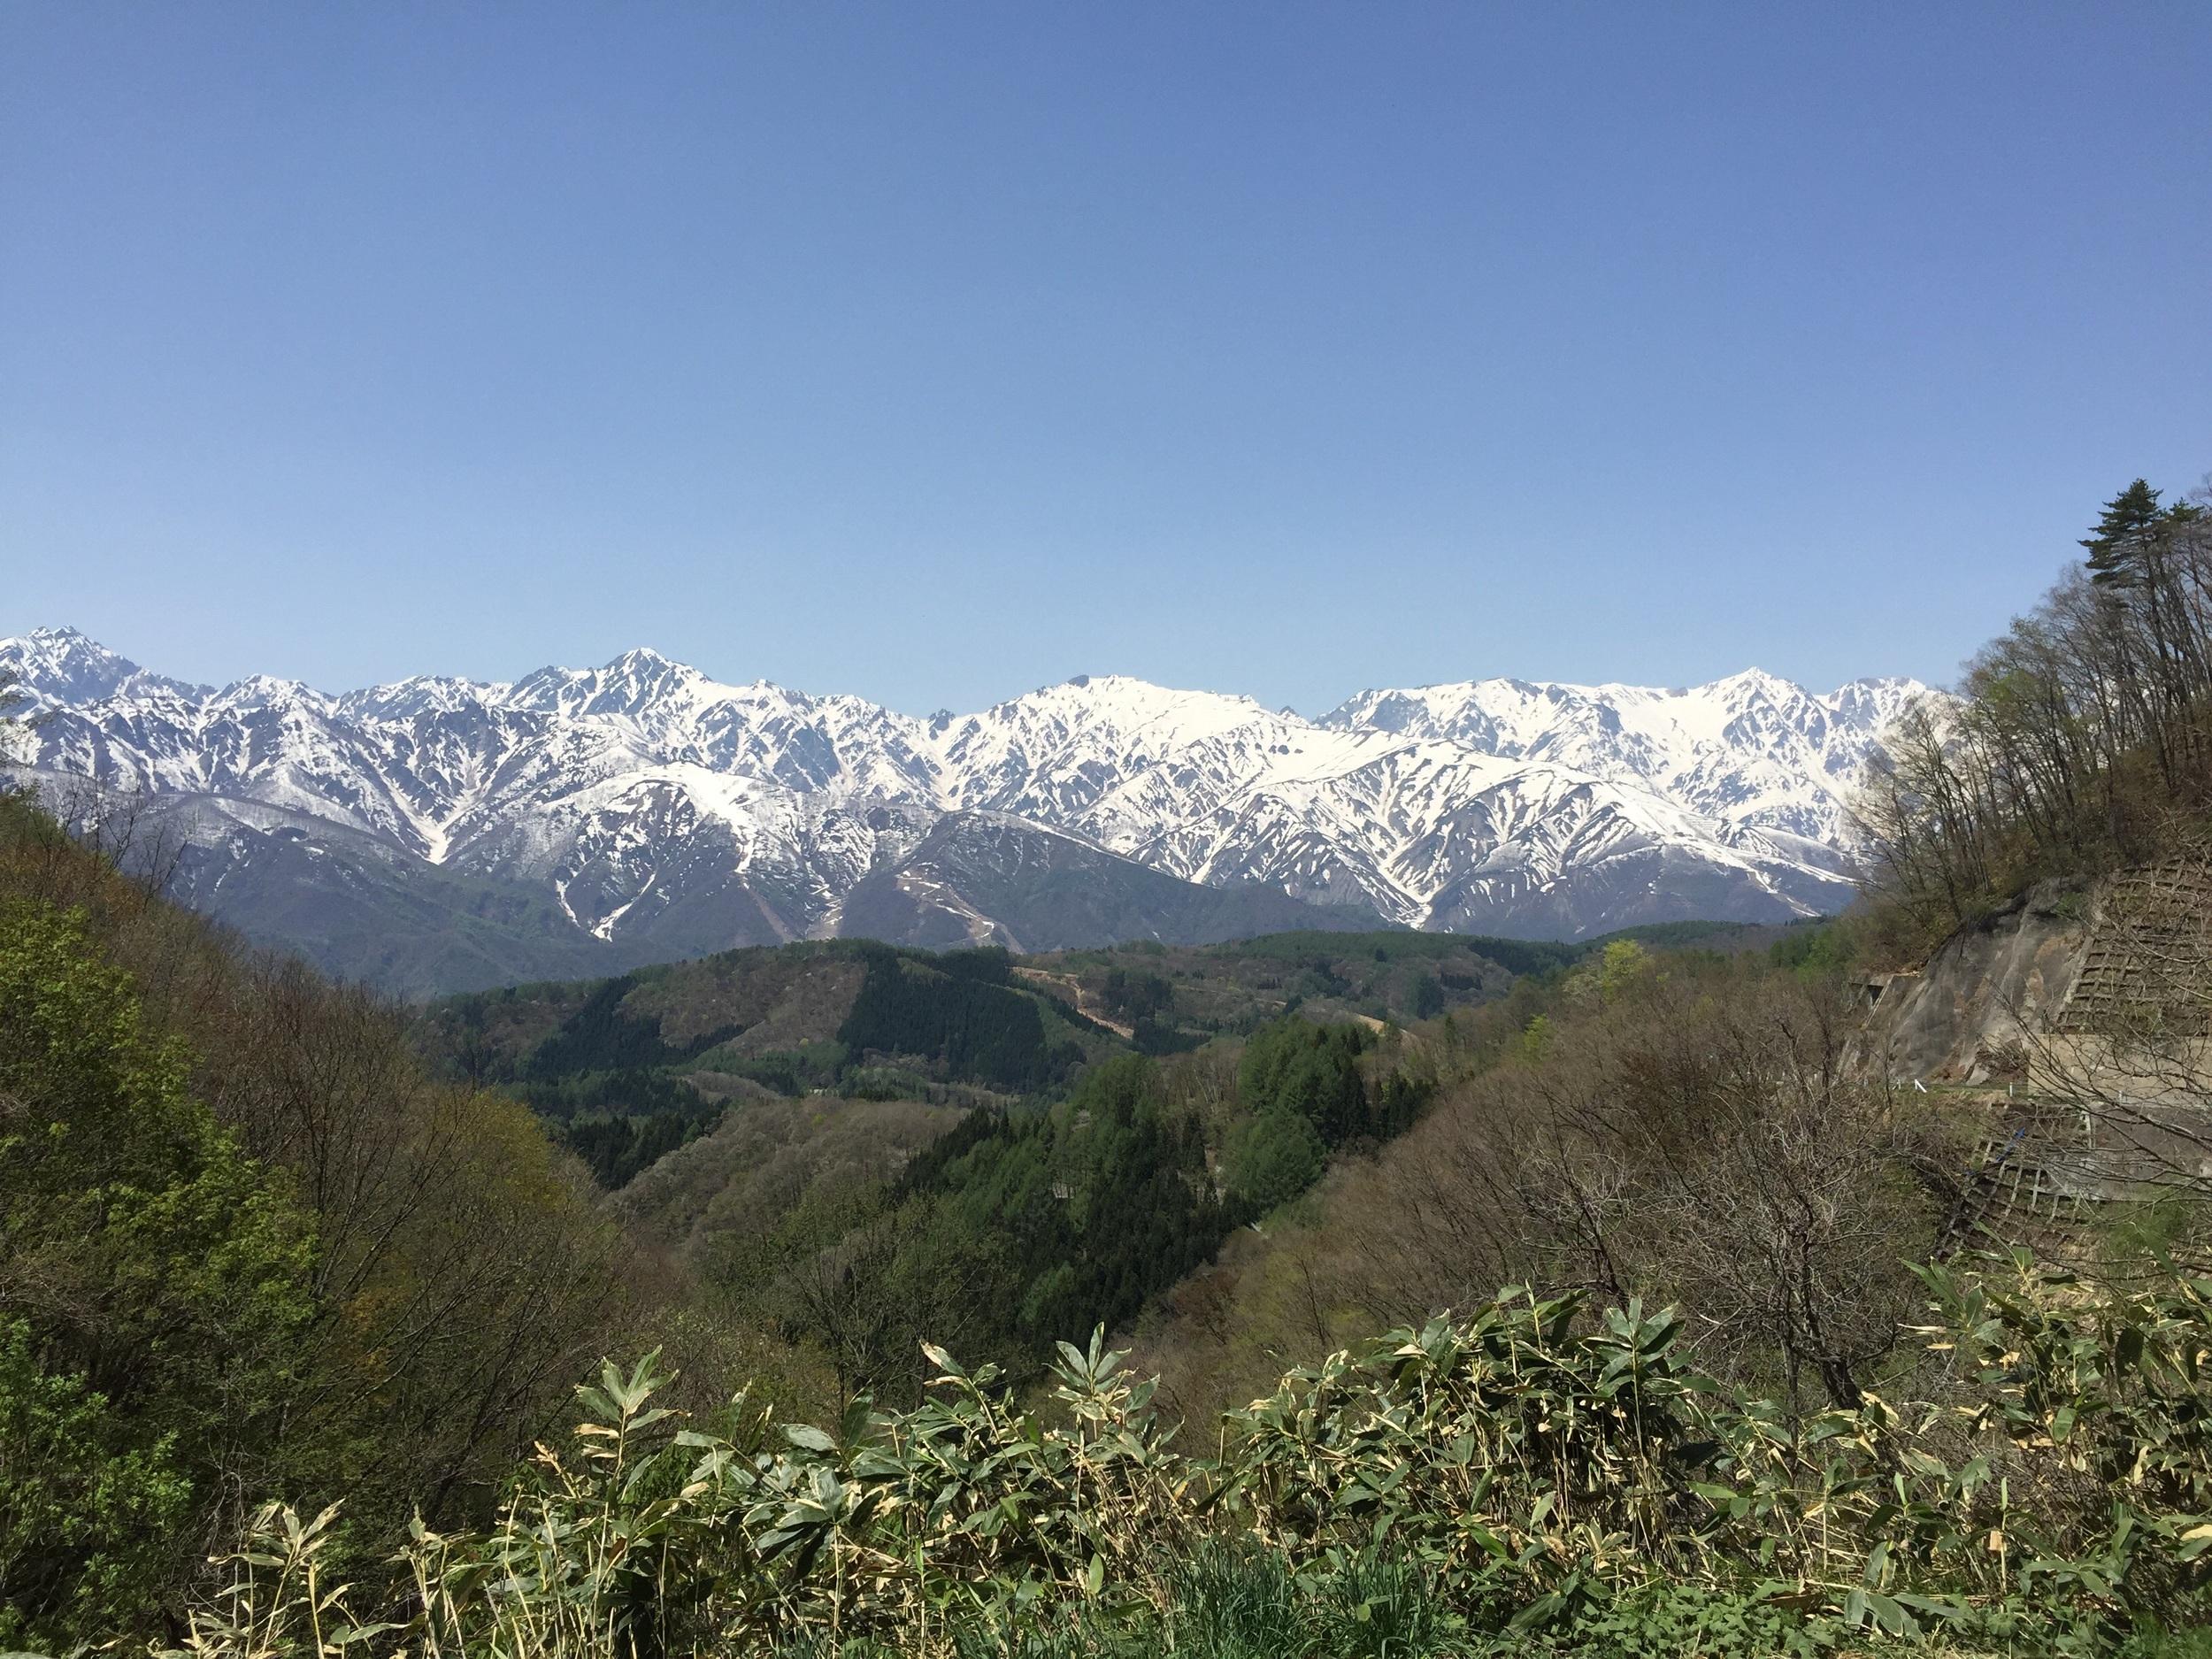 Hakuba valley from the old Nagano road